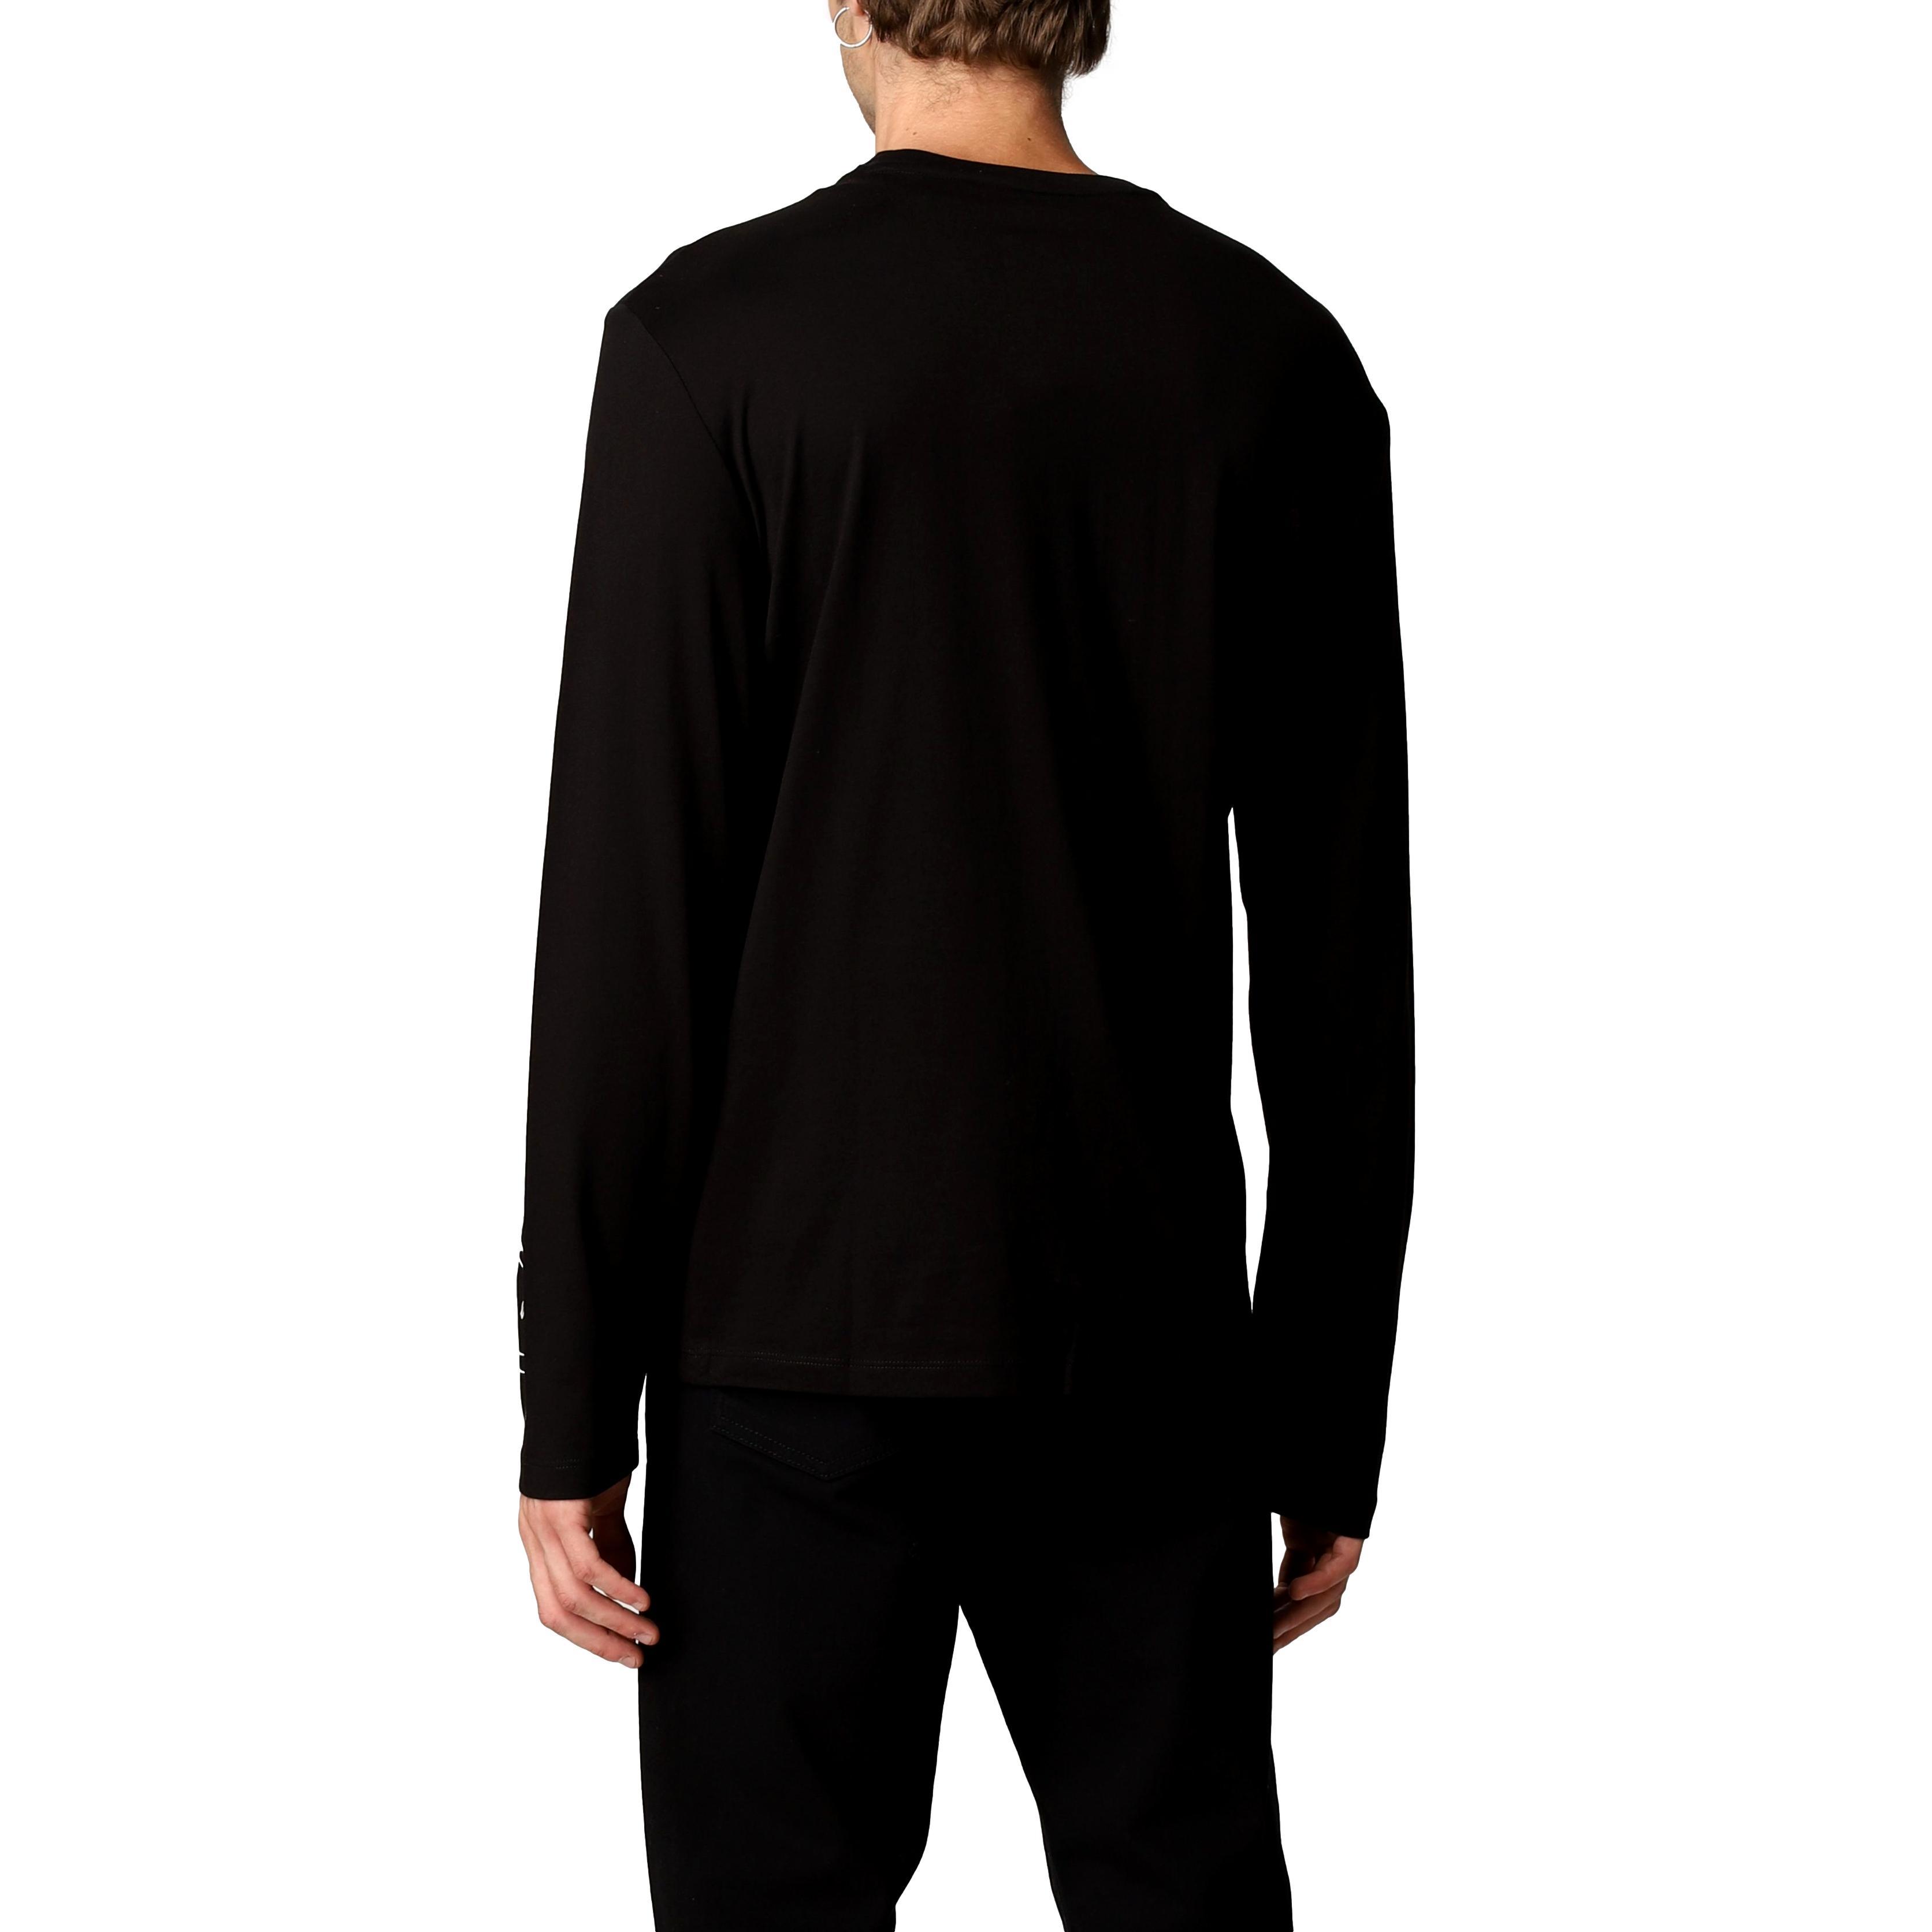 T-shirt manica lunga ARMANI EXCHANGE | T-shirt | 6KZTFJ ZJBVZ1200